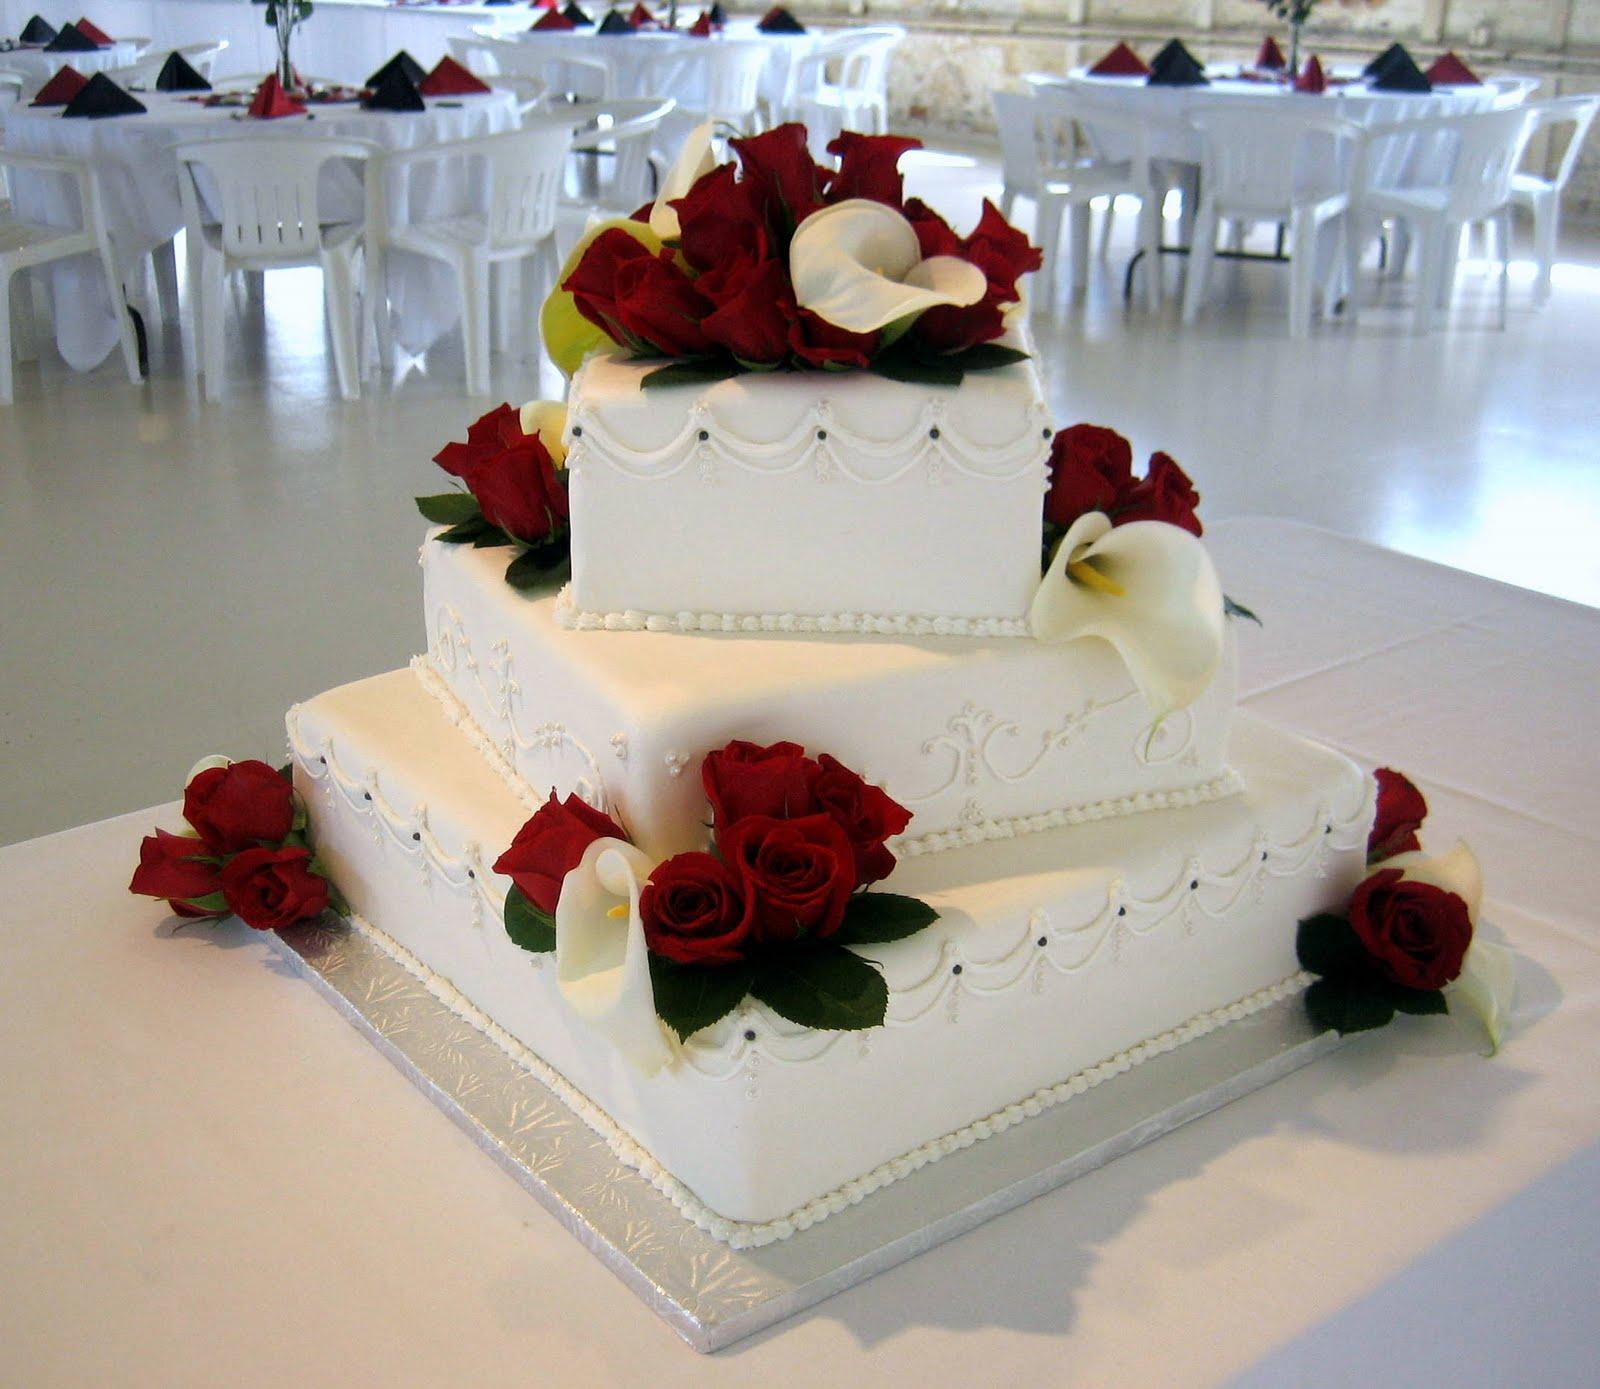 Jillicious Discoveries Three Purple Wedding Cakes: Jillicious Discoveries: Mission Mill Wedding Cake